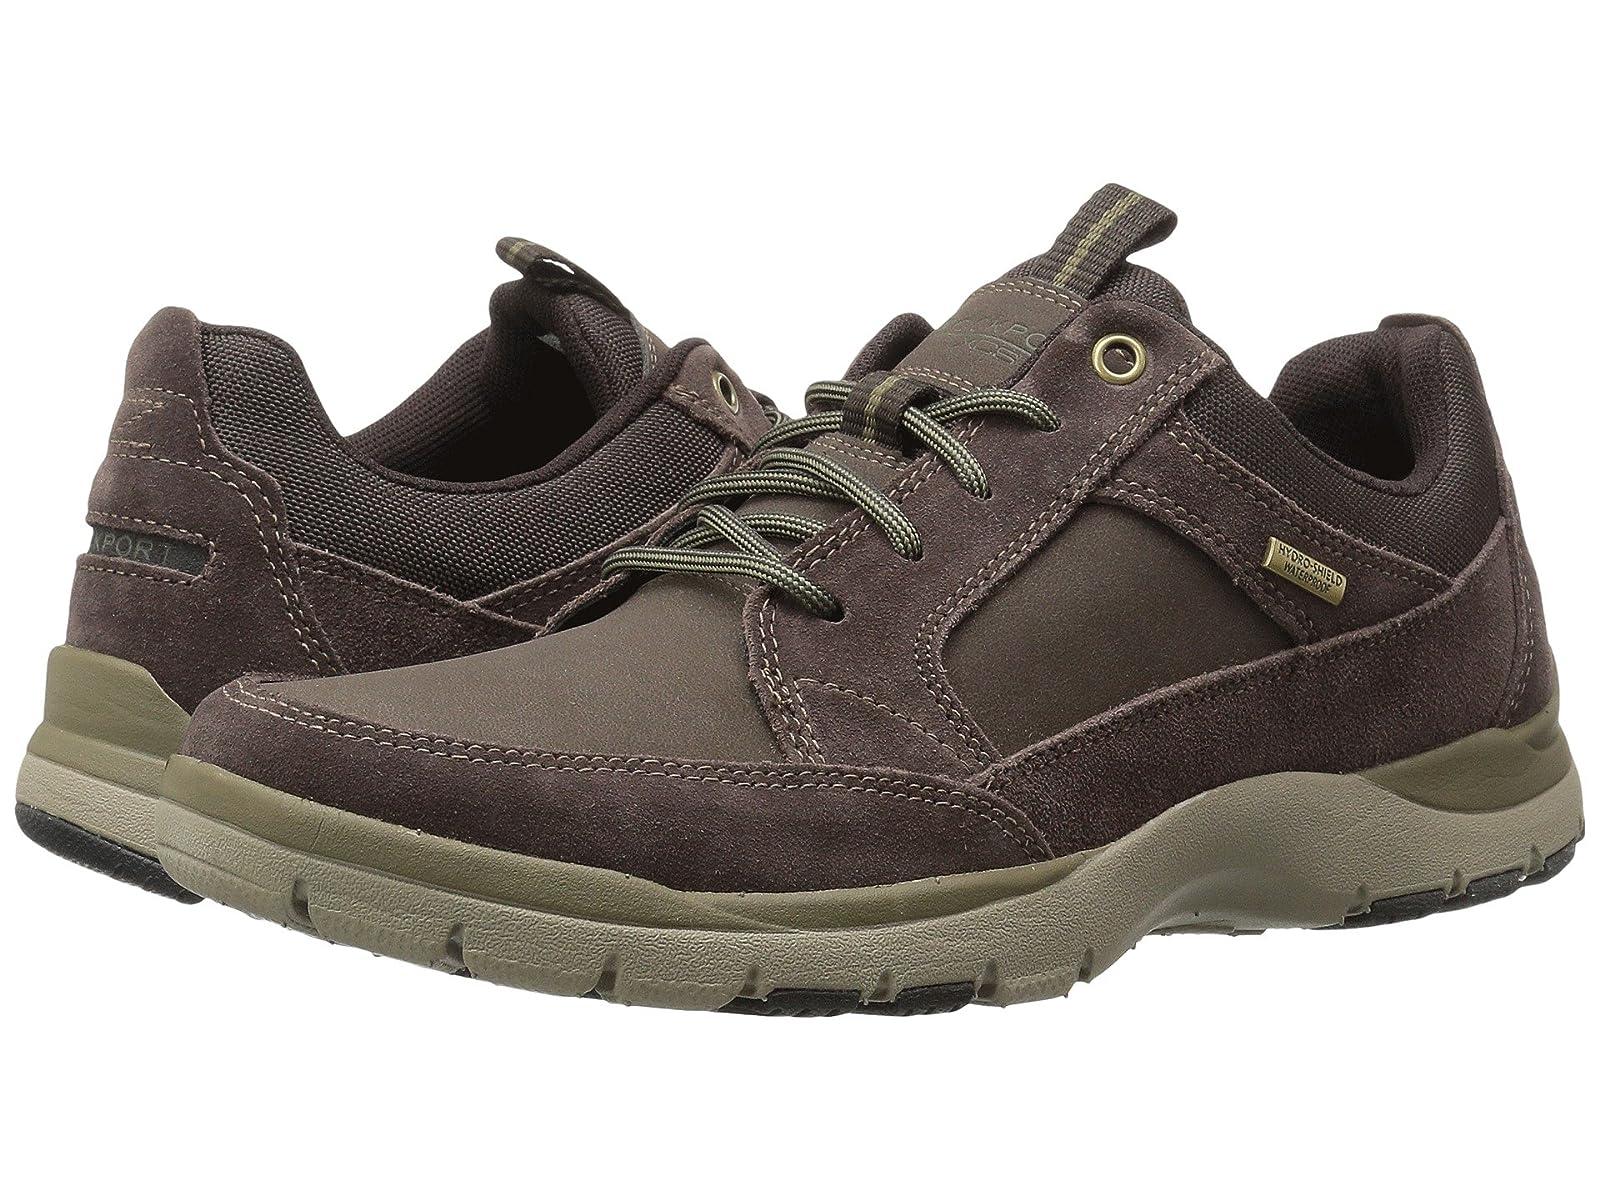 Rockport Kingstin Waterproof BlucherCheap and distinctive eye-catching shoes